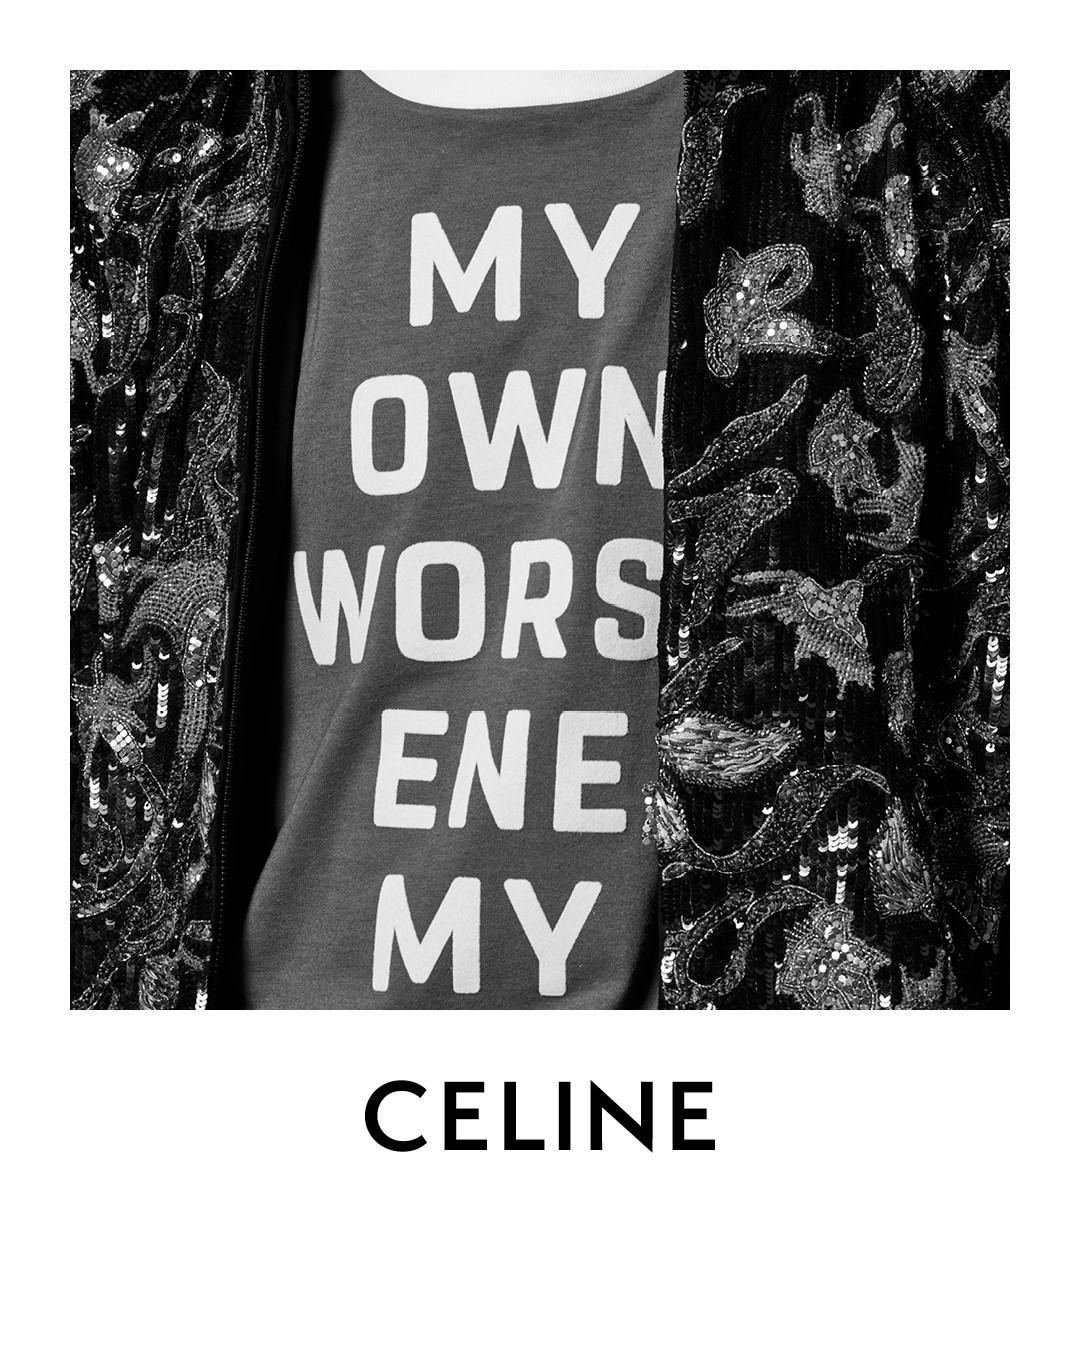 All images courtesy of Celine